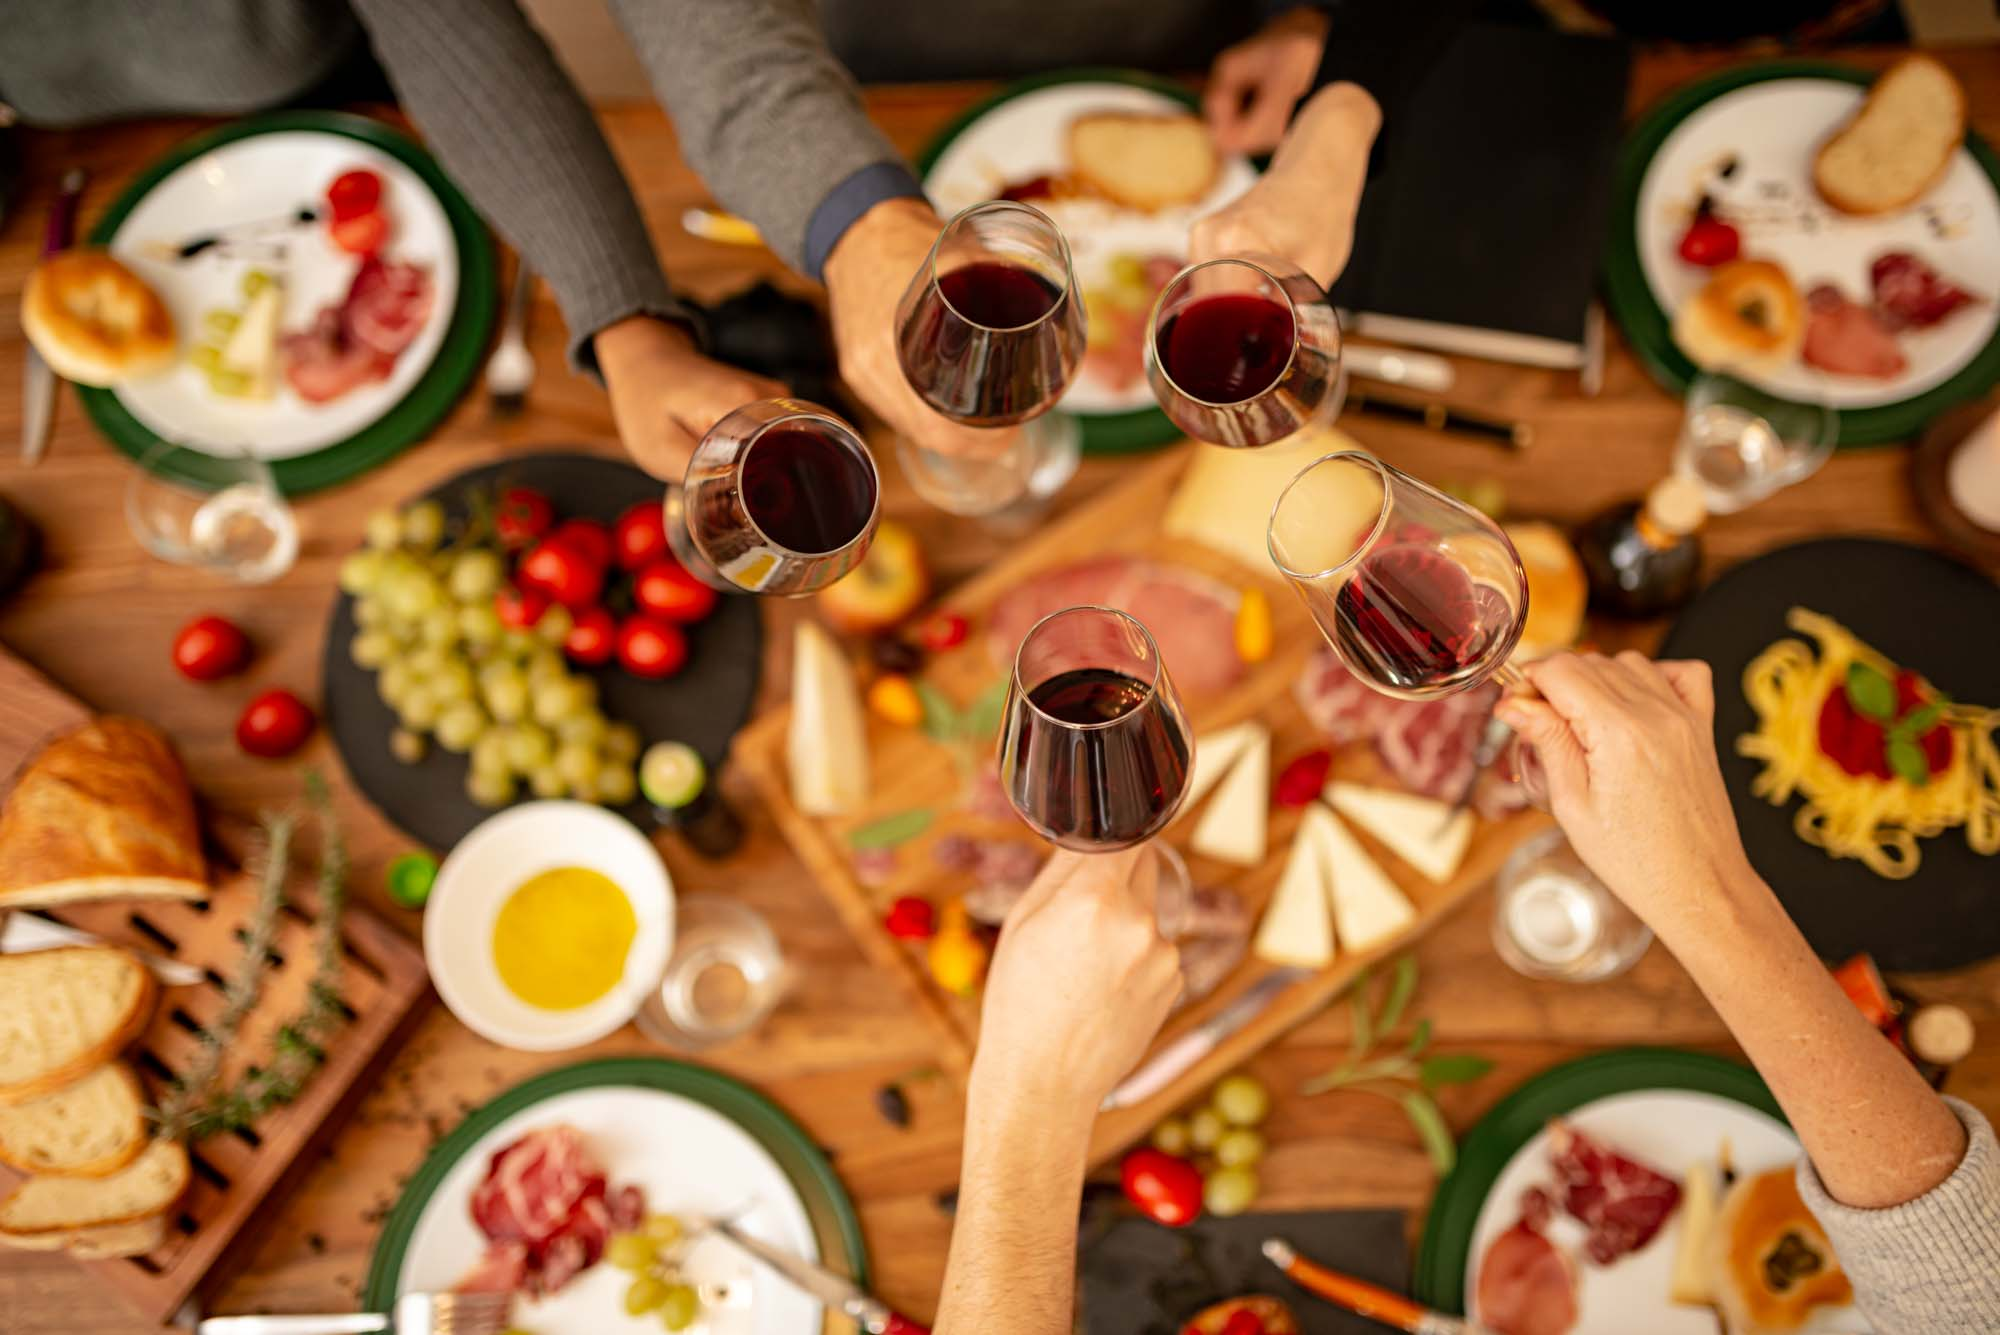 Corsi Di Cucina Formazione Manageriale a Venezia